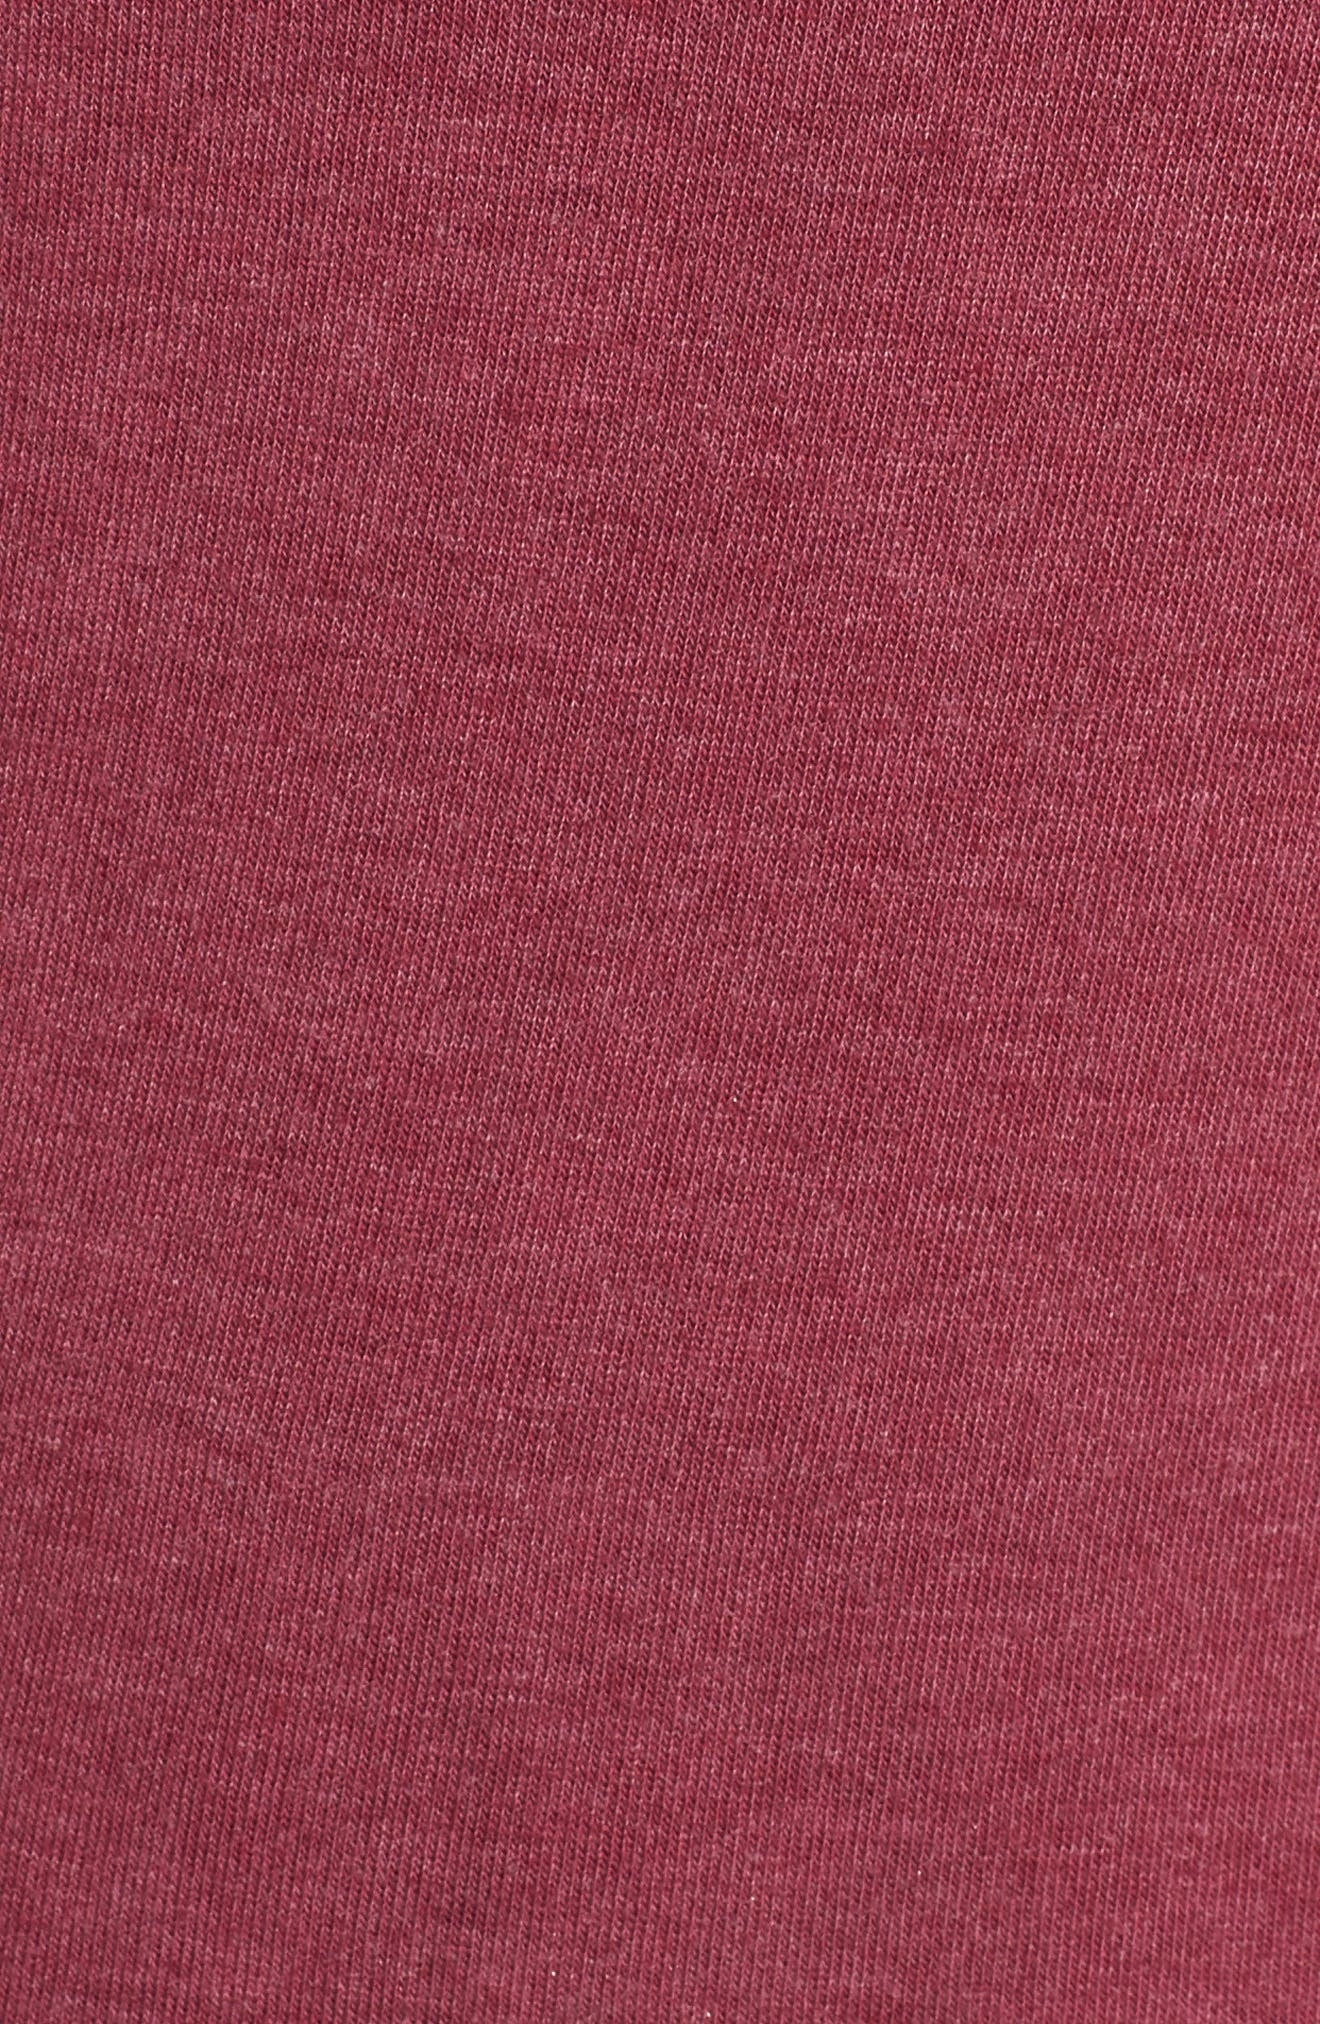 Varsity Crop Sweatshirt,                             Alternate thumbnail 6, color,                             AMOR